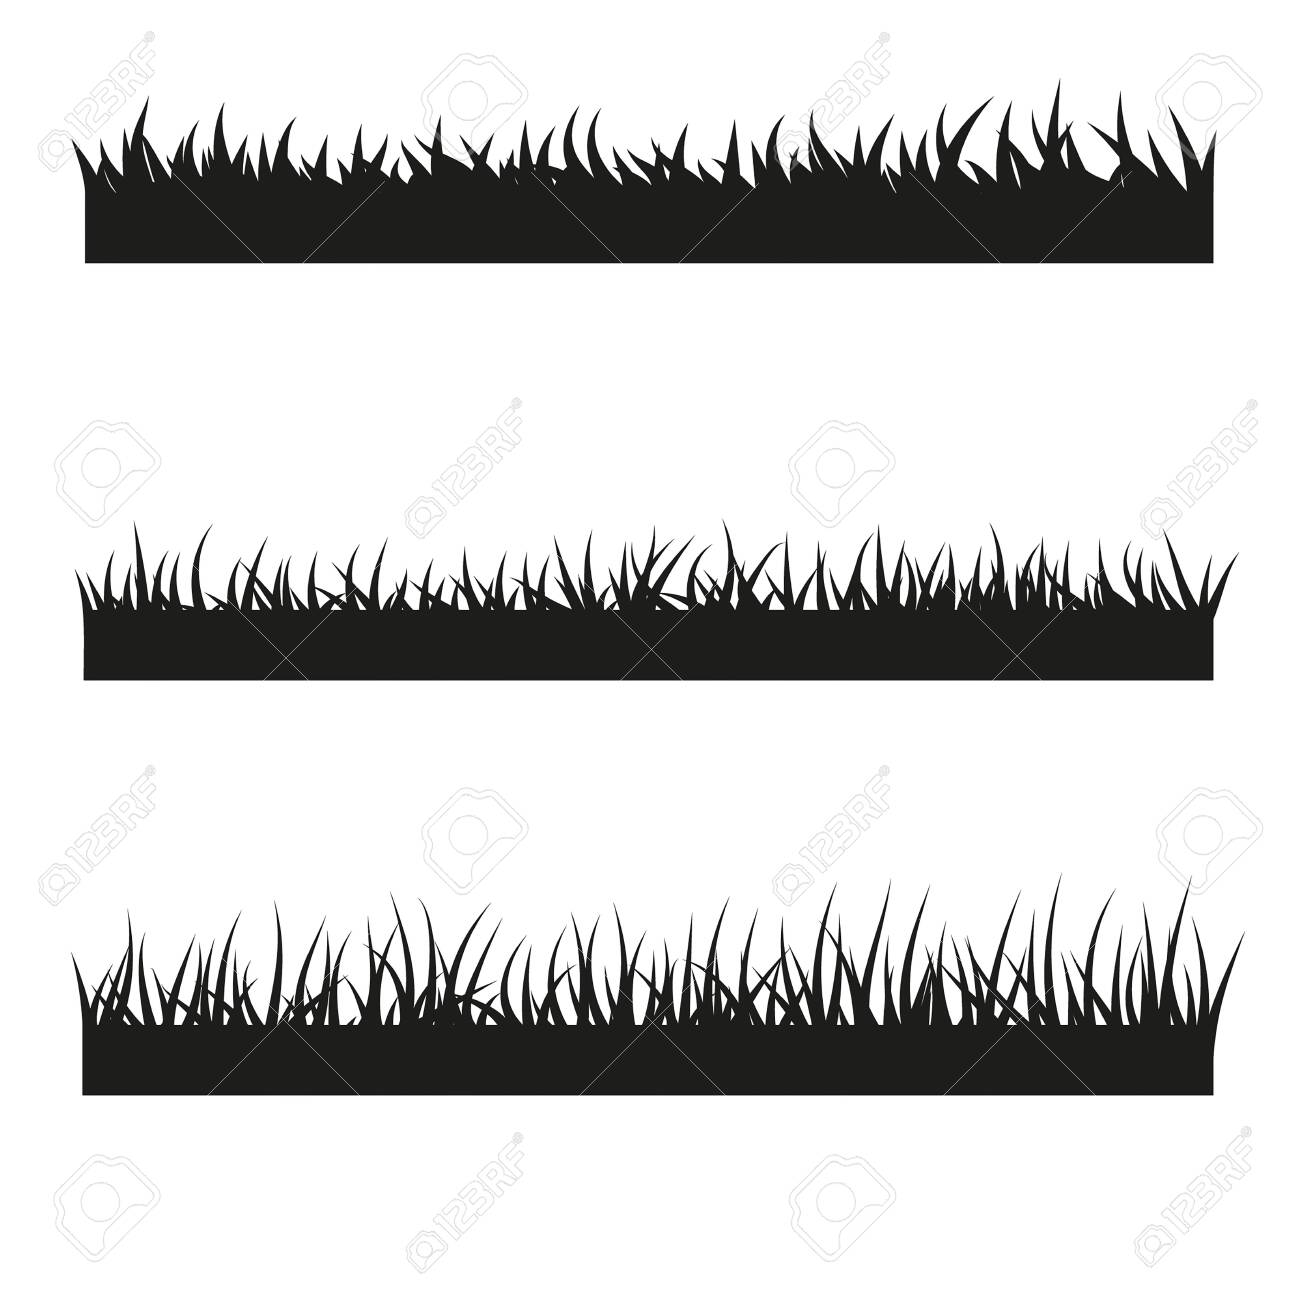 Vector set of black grass illustration - 137322246